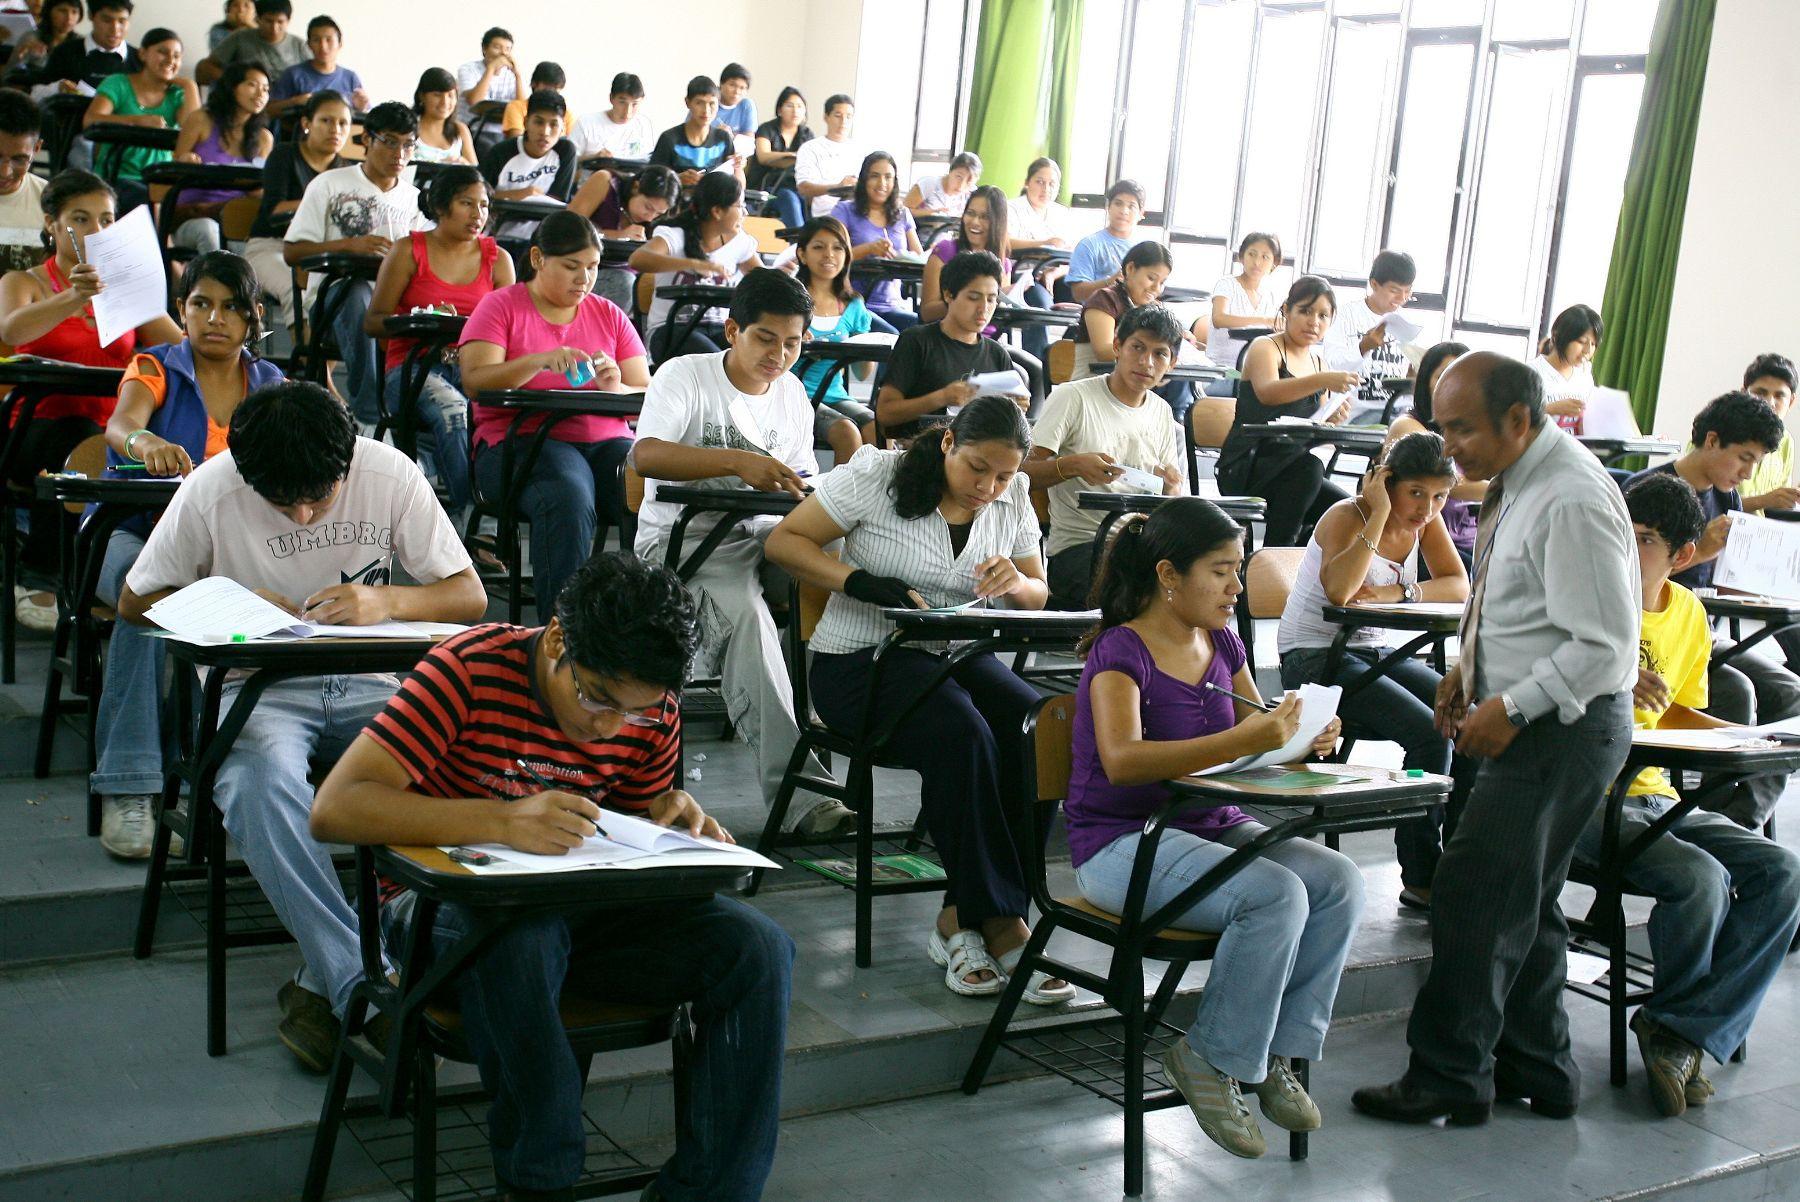 comision-de-educacion-aprobo-bachillerato-automatico-universitario